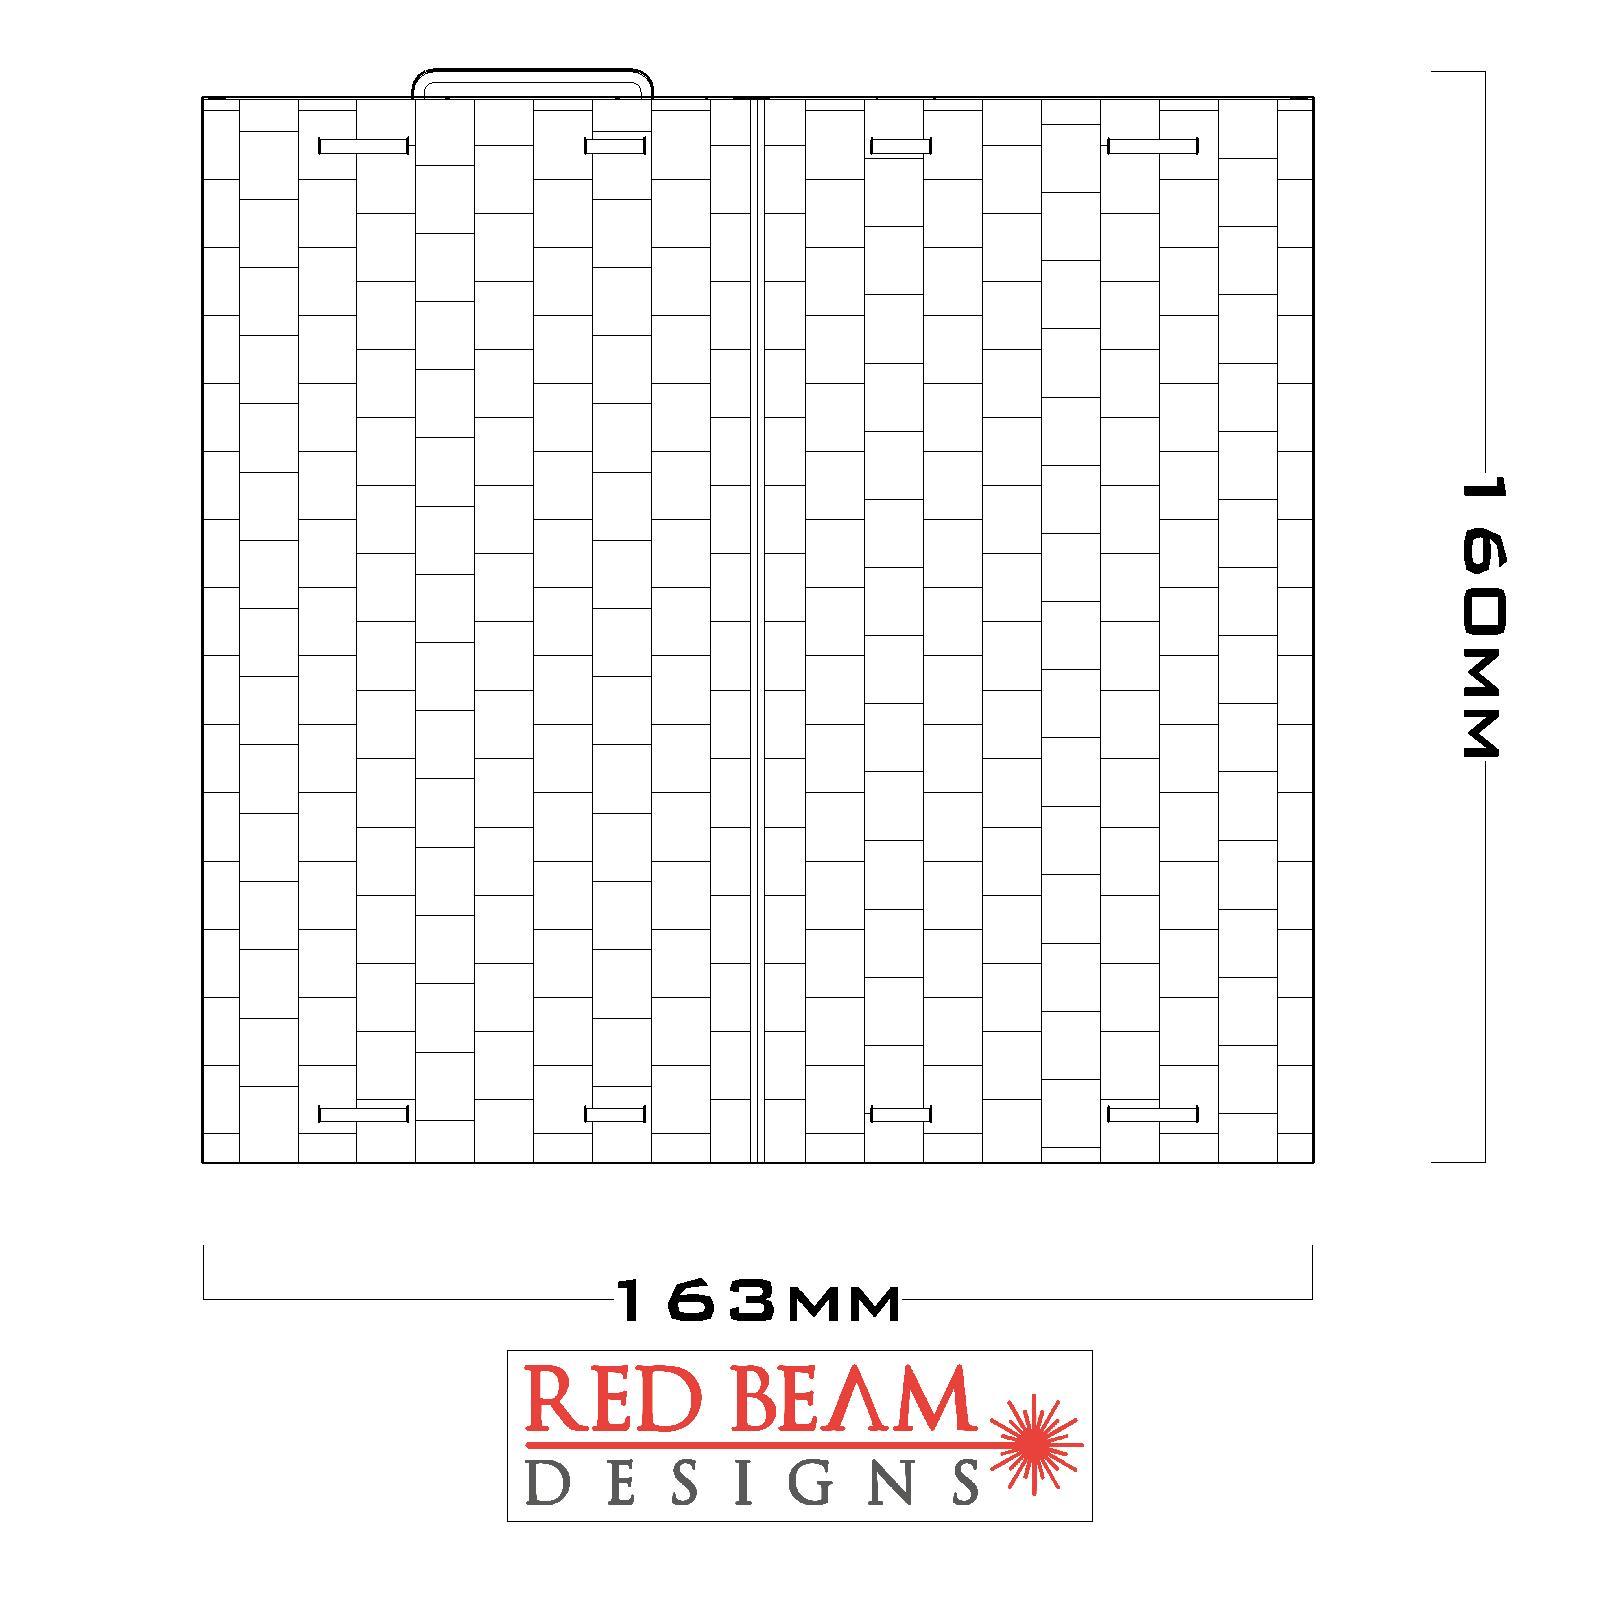 RBD820004_RENDER0003.jpg